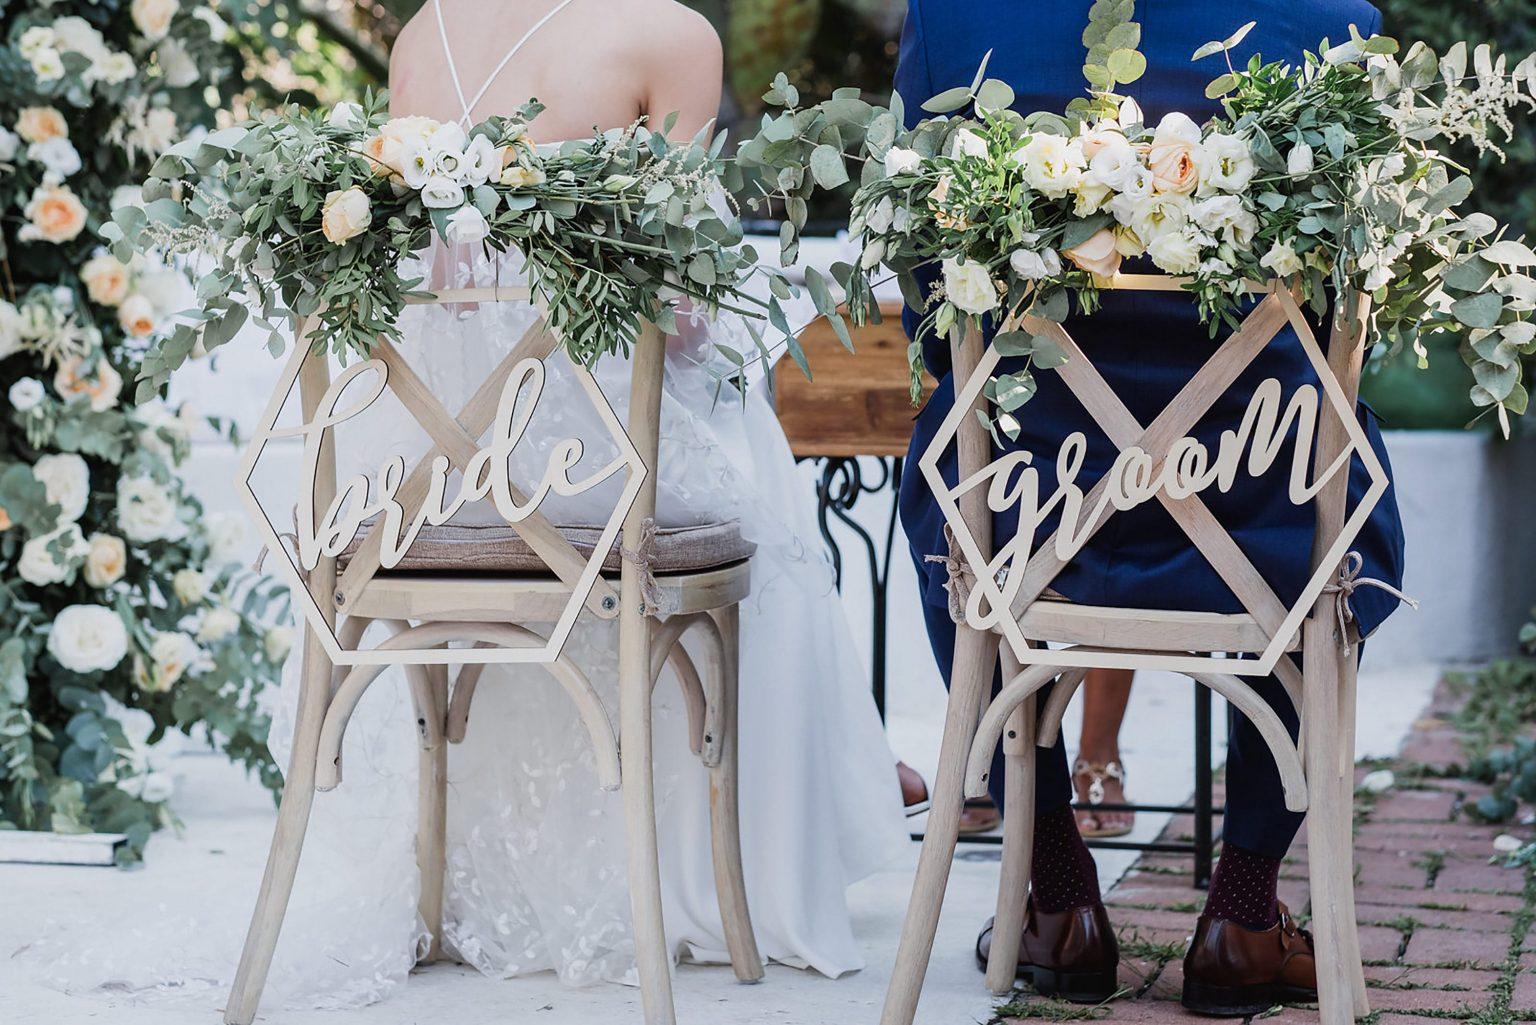 Su Gologone wedding, bride and groom chairs